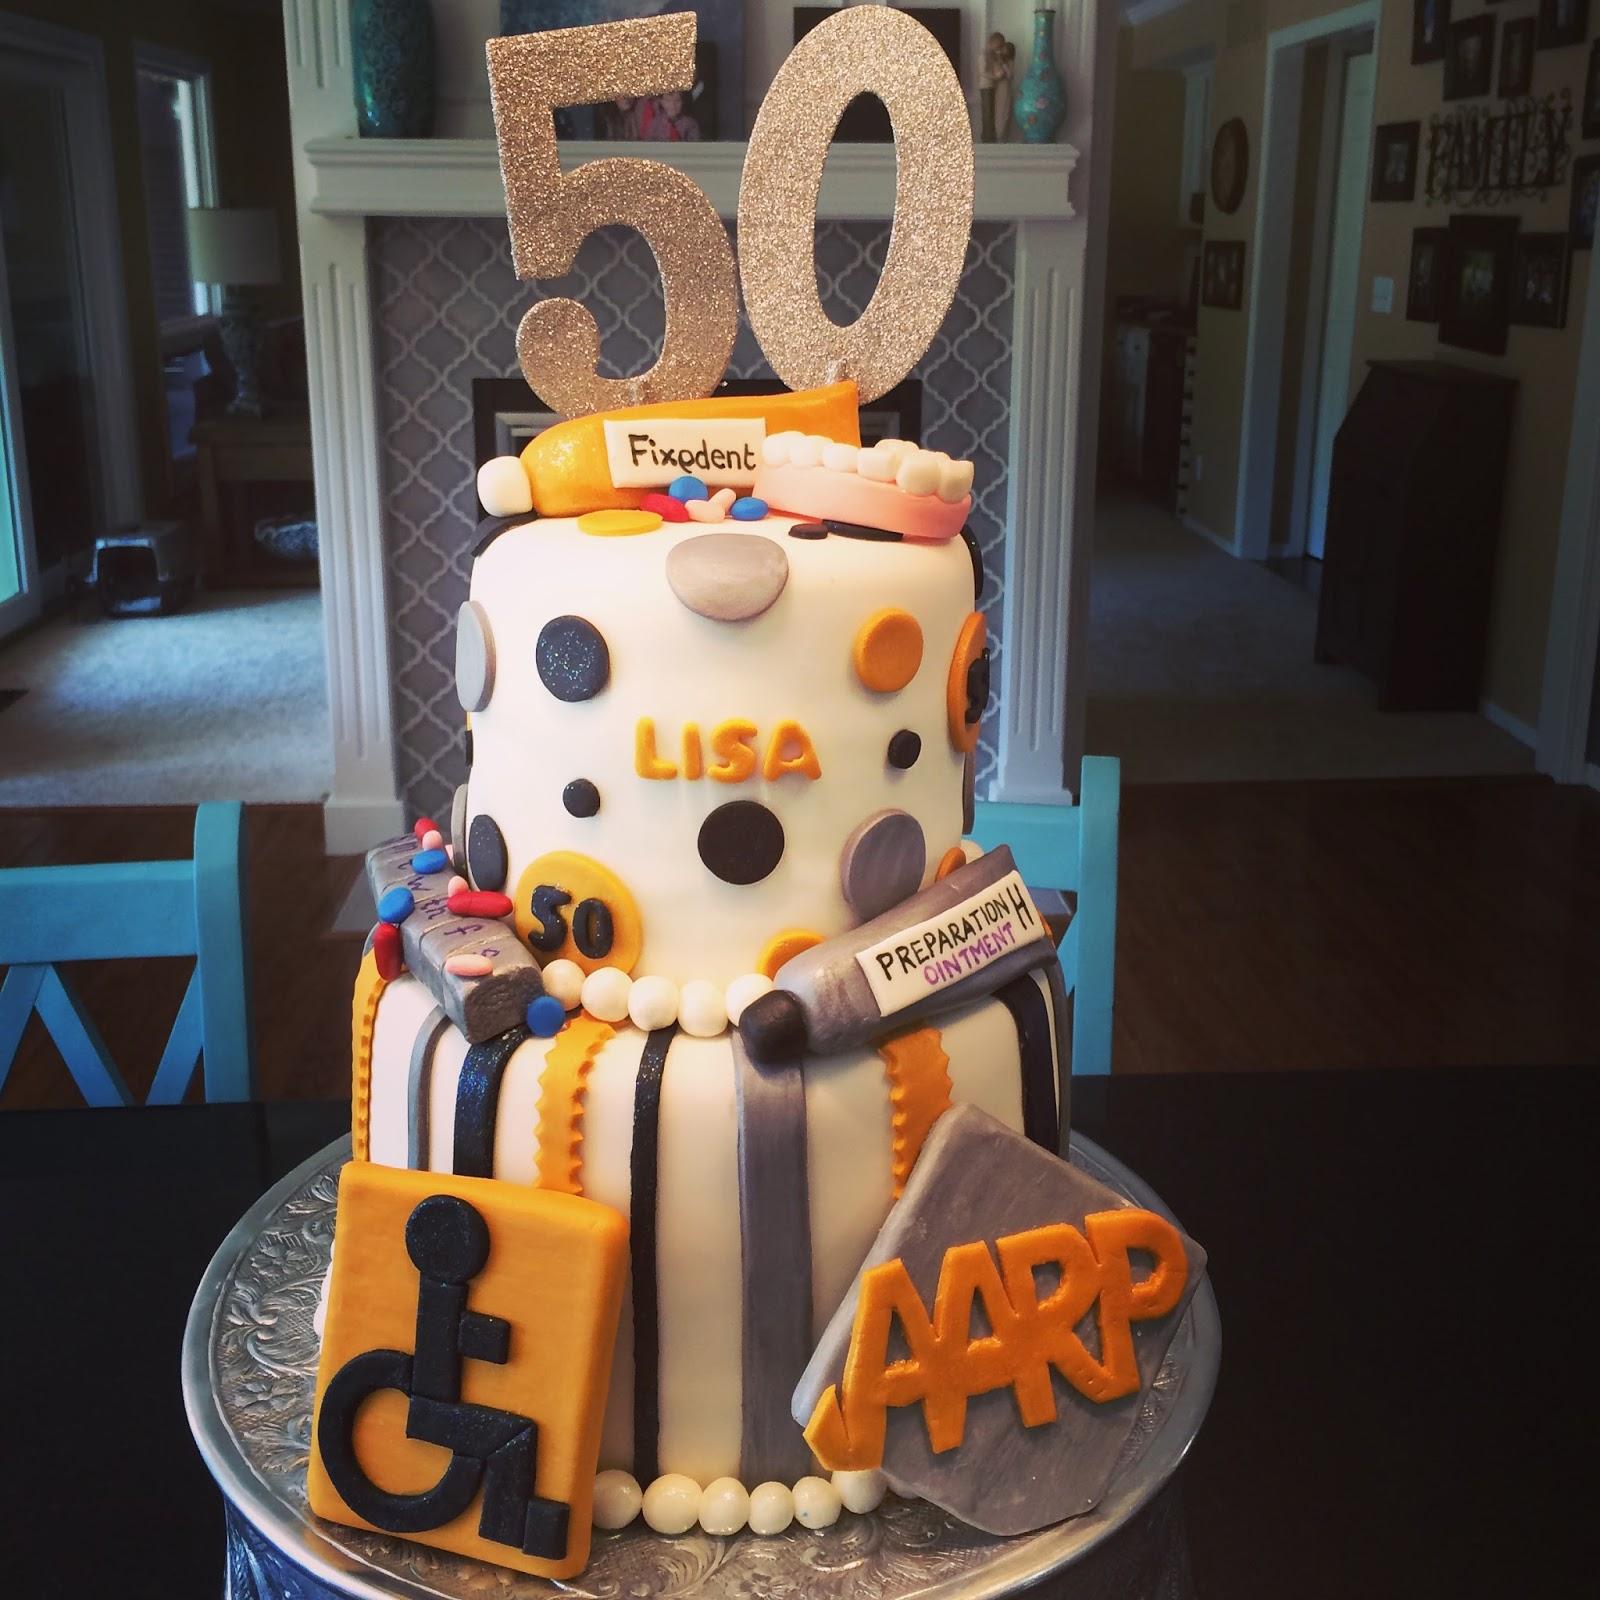 Sugarlips Cakery Best 50th Birthday Cake Ever